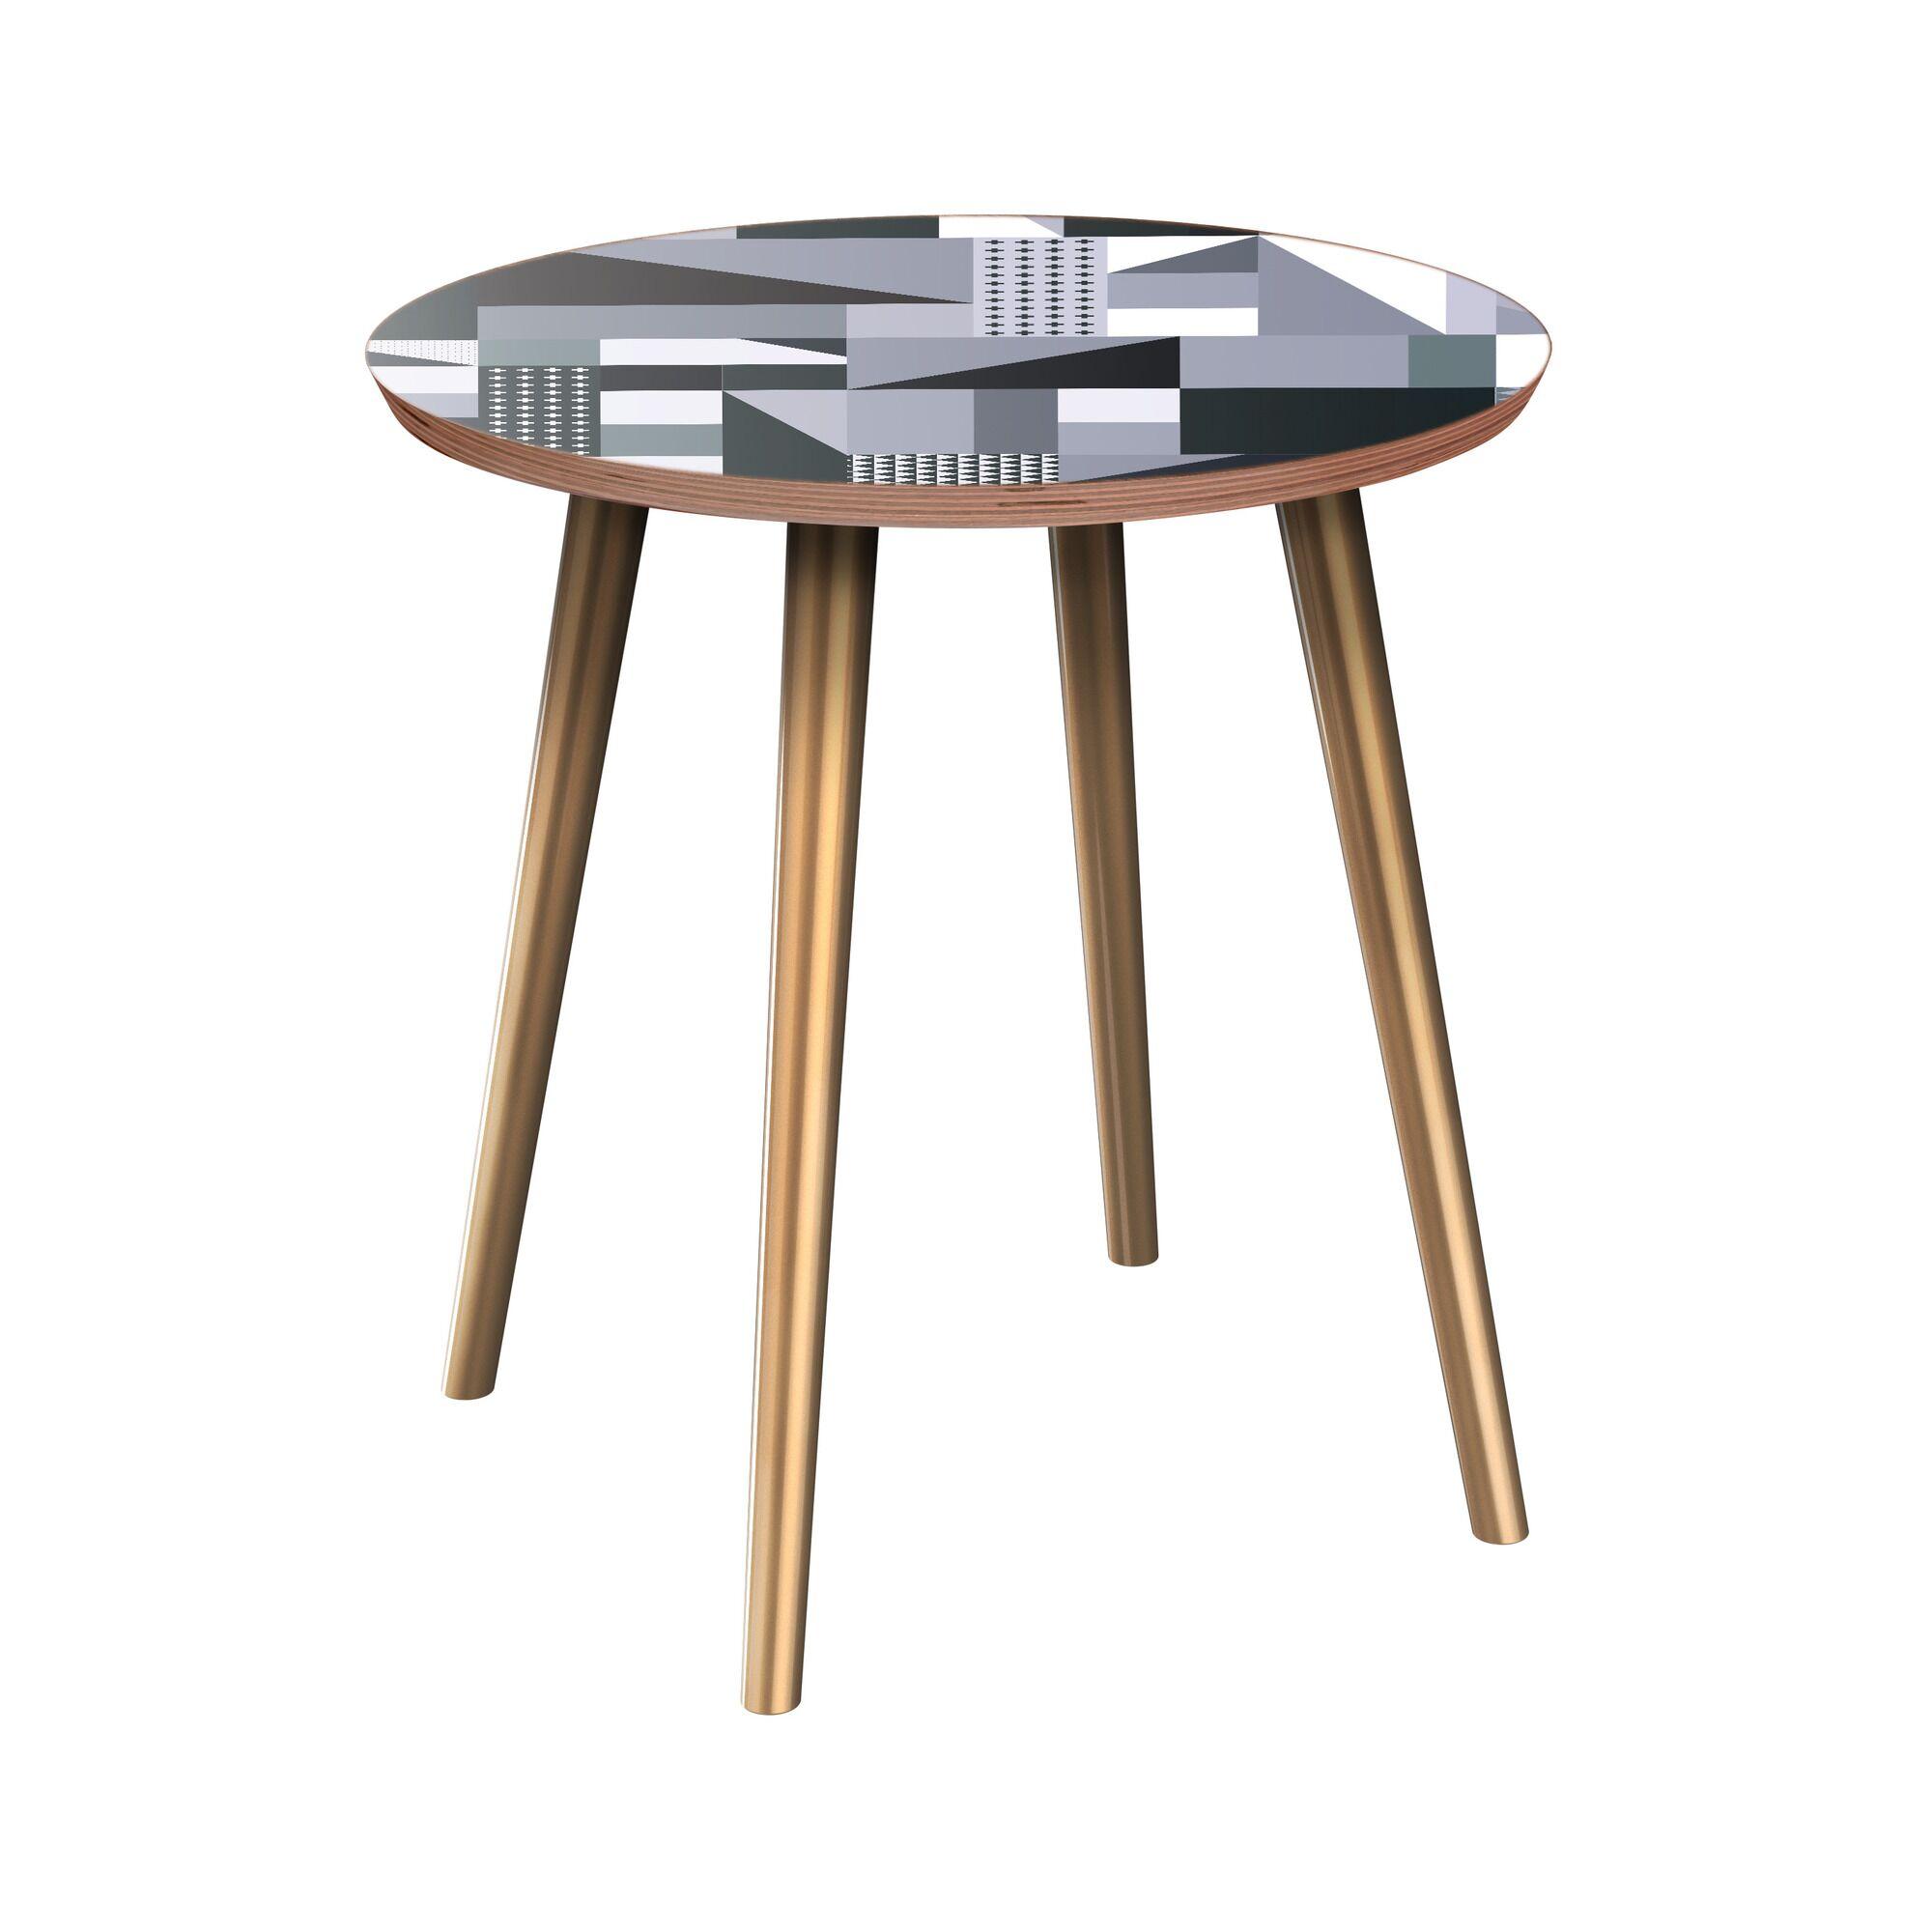 Rhem End Table Table Base Color: Brass, Table Top Color: Walnut